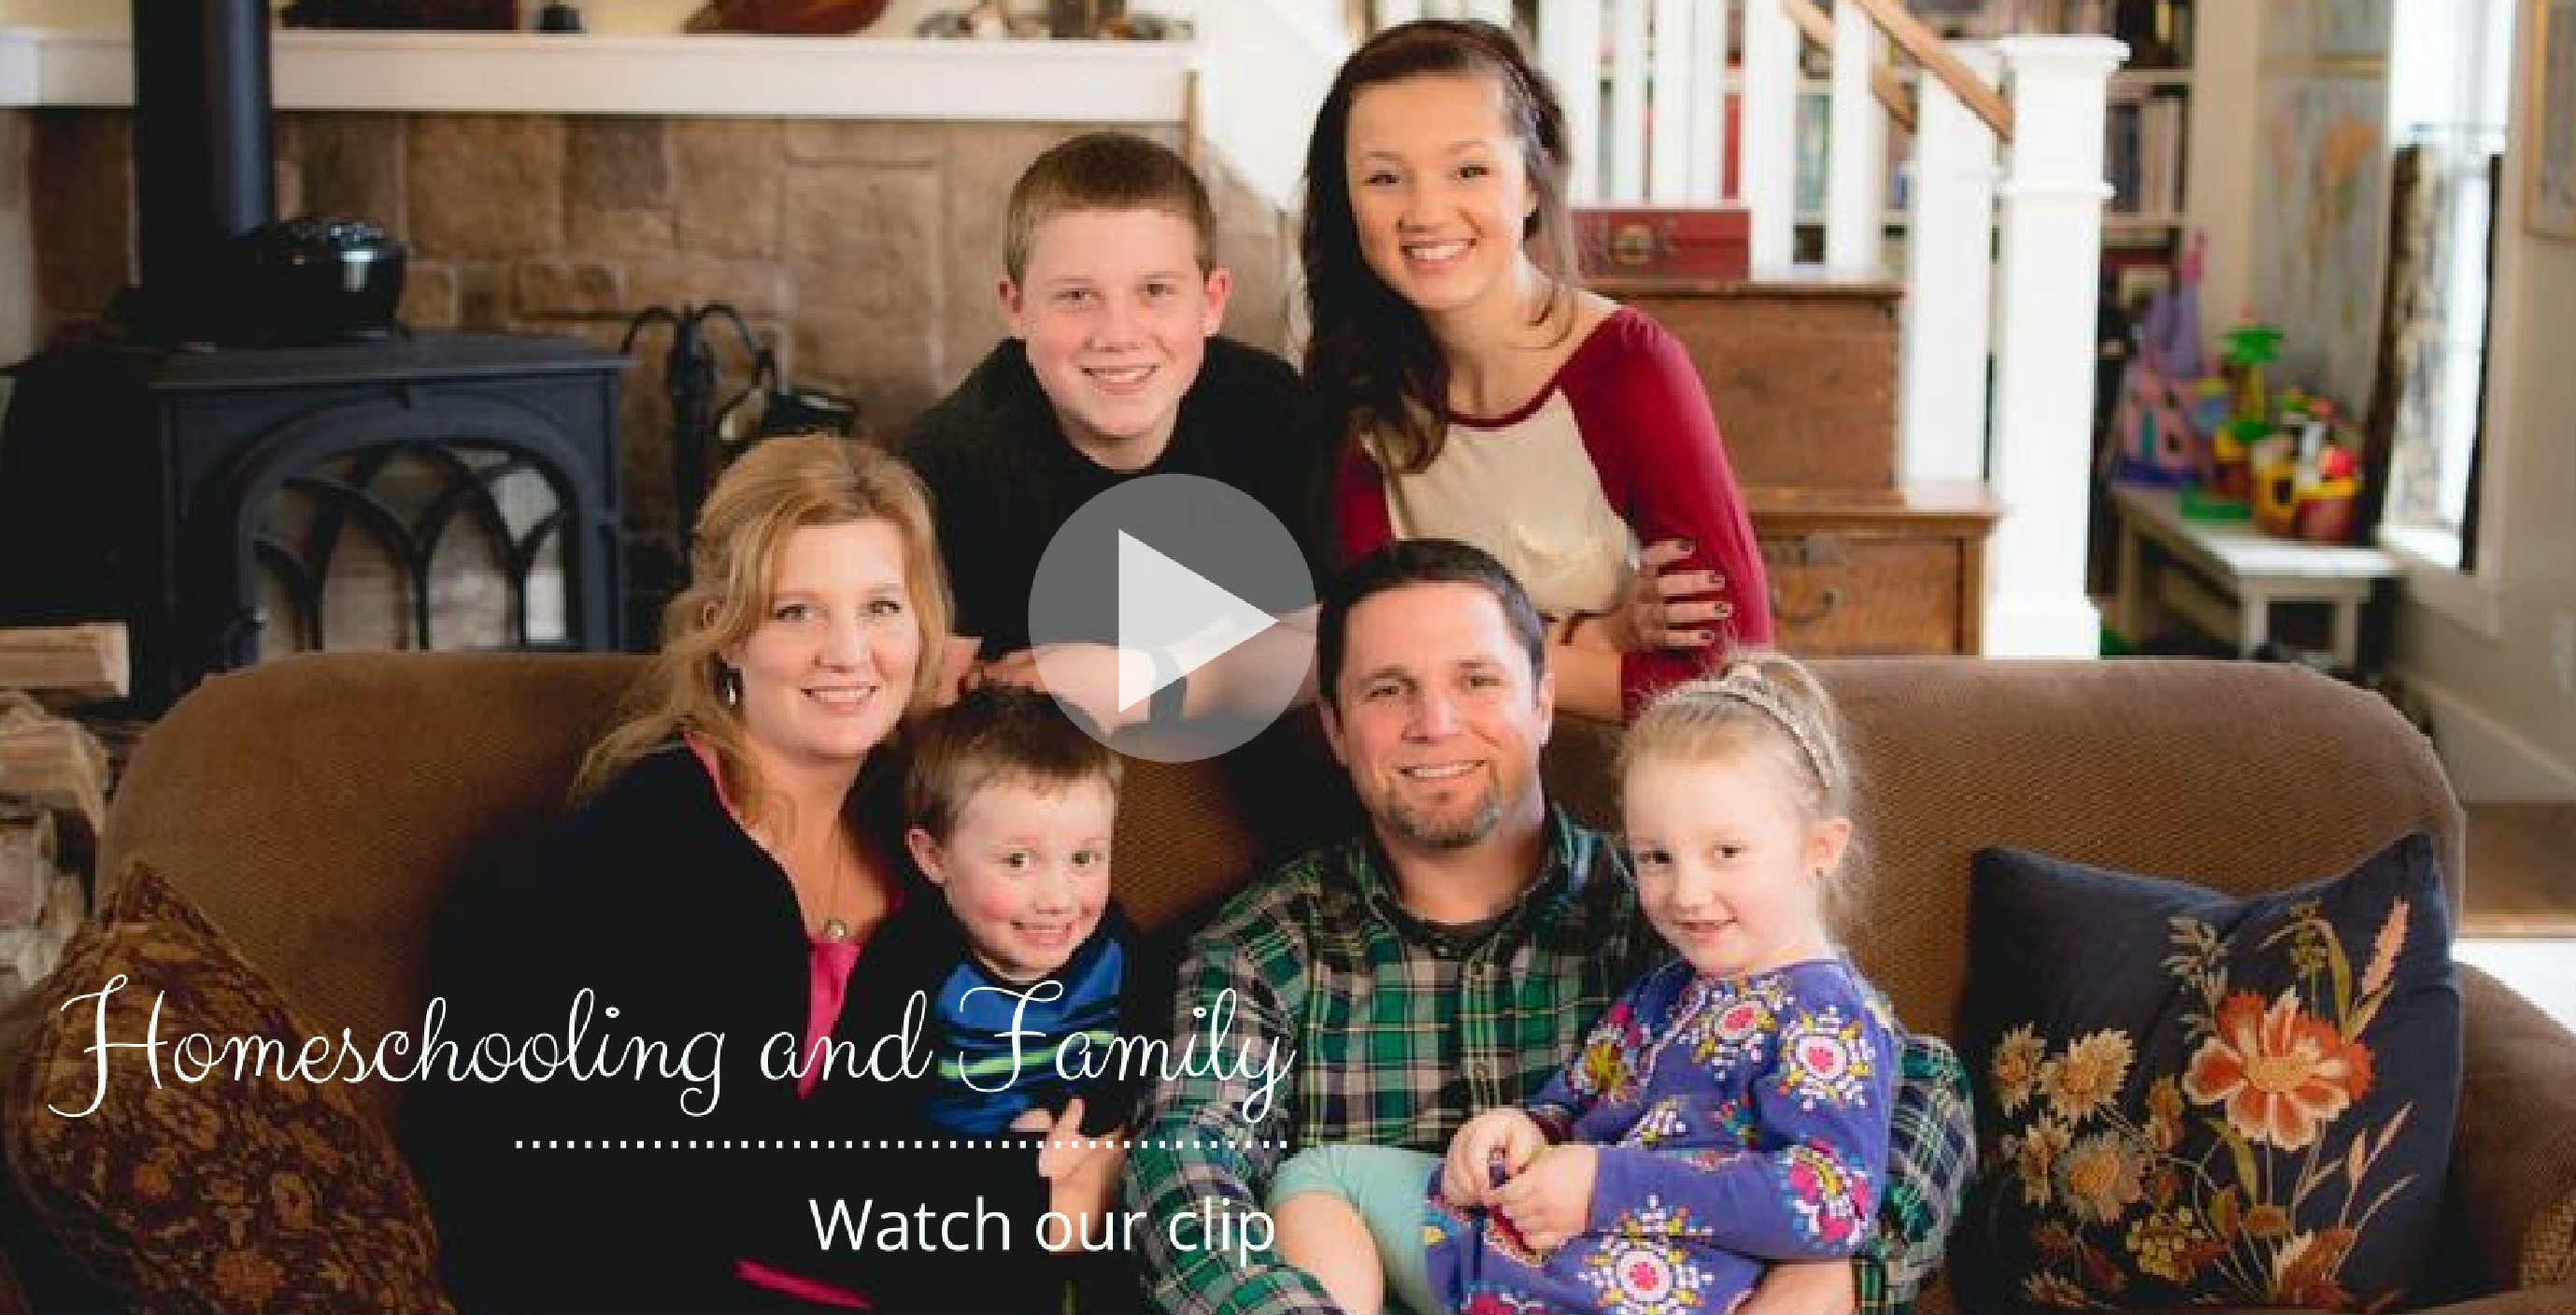 Families-Video-Clip